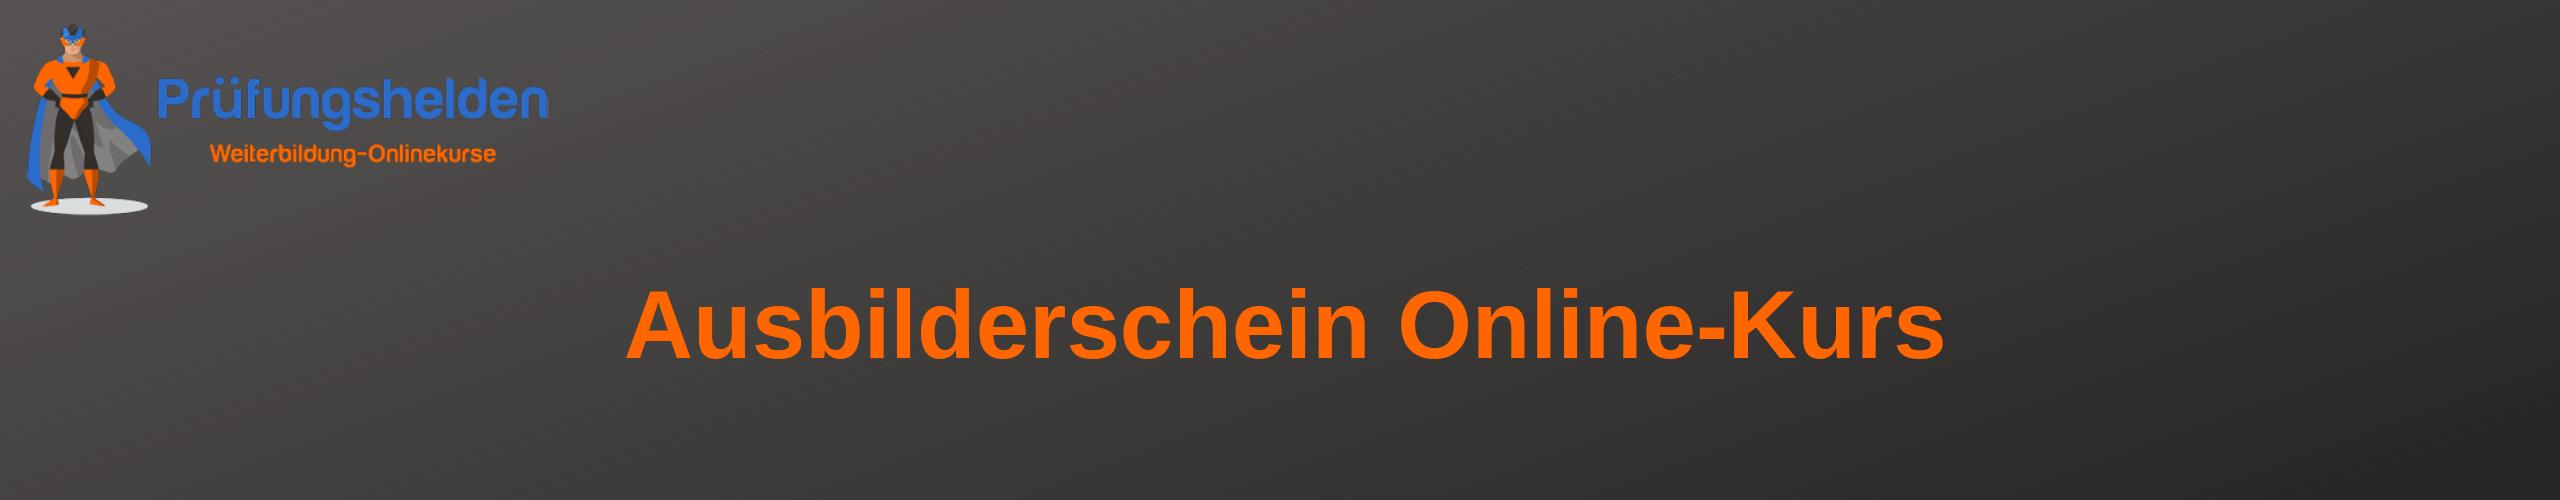 Ausbilderschein-Onlinekurs.de